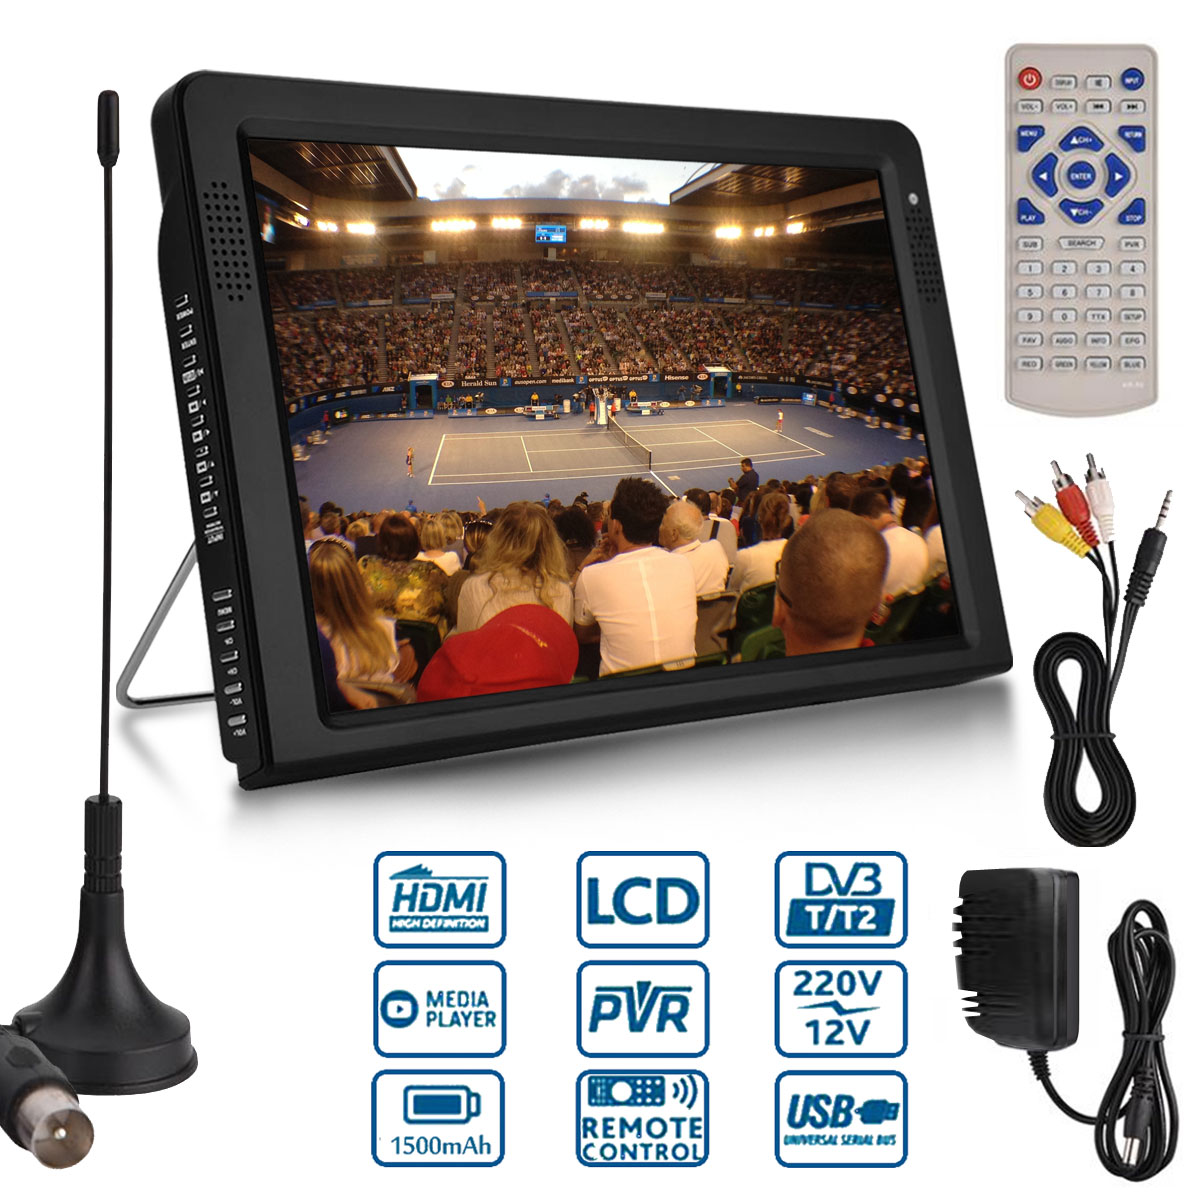 10.2 Polegada 1080 p pvr 12 v portátil dvb-t/DVB-T2 tft led hd tv televisão digital analógico ac/dc